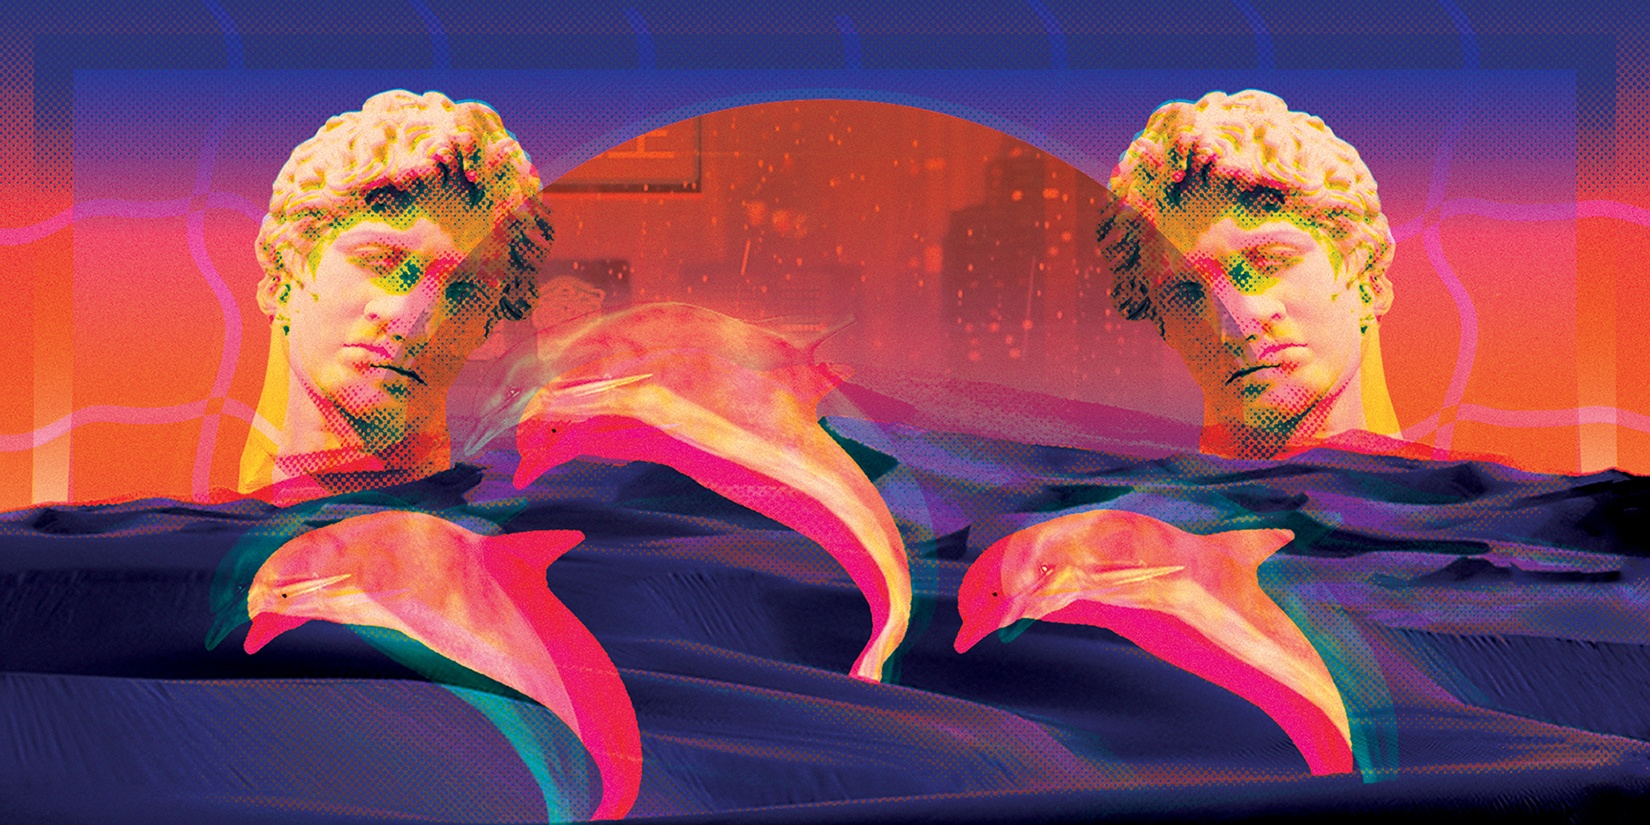 Vaporwave: subversive dream music for the post-Internet age |